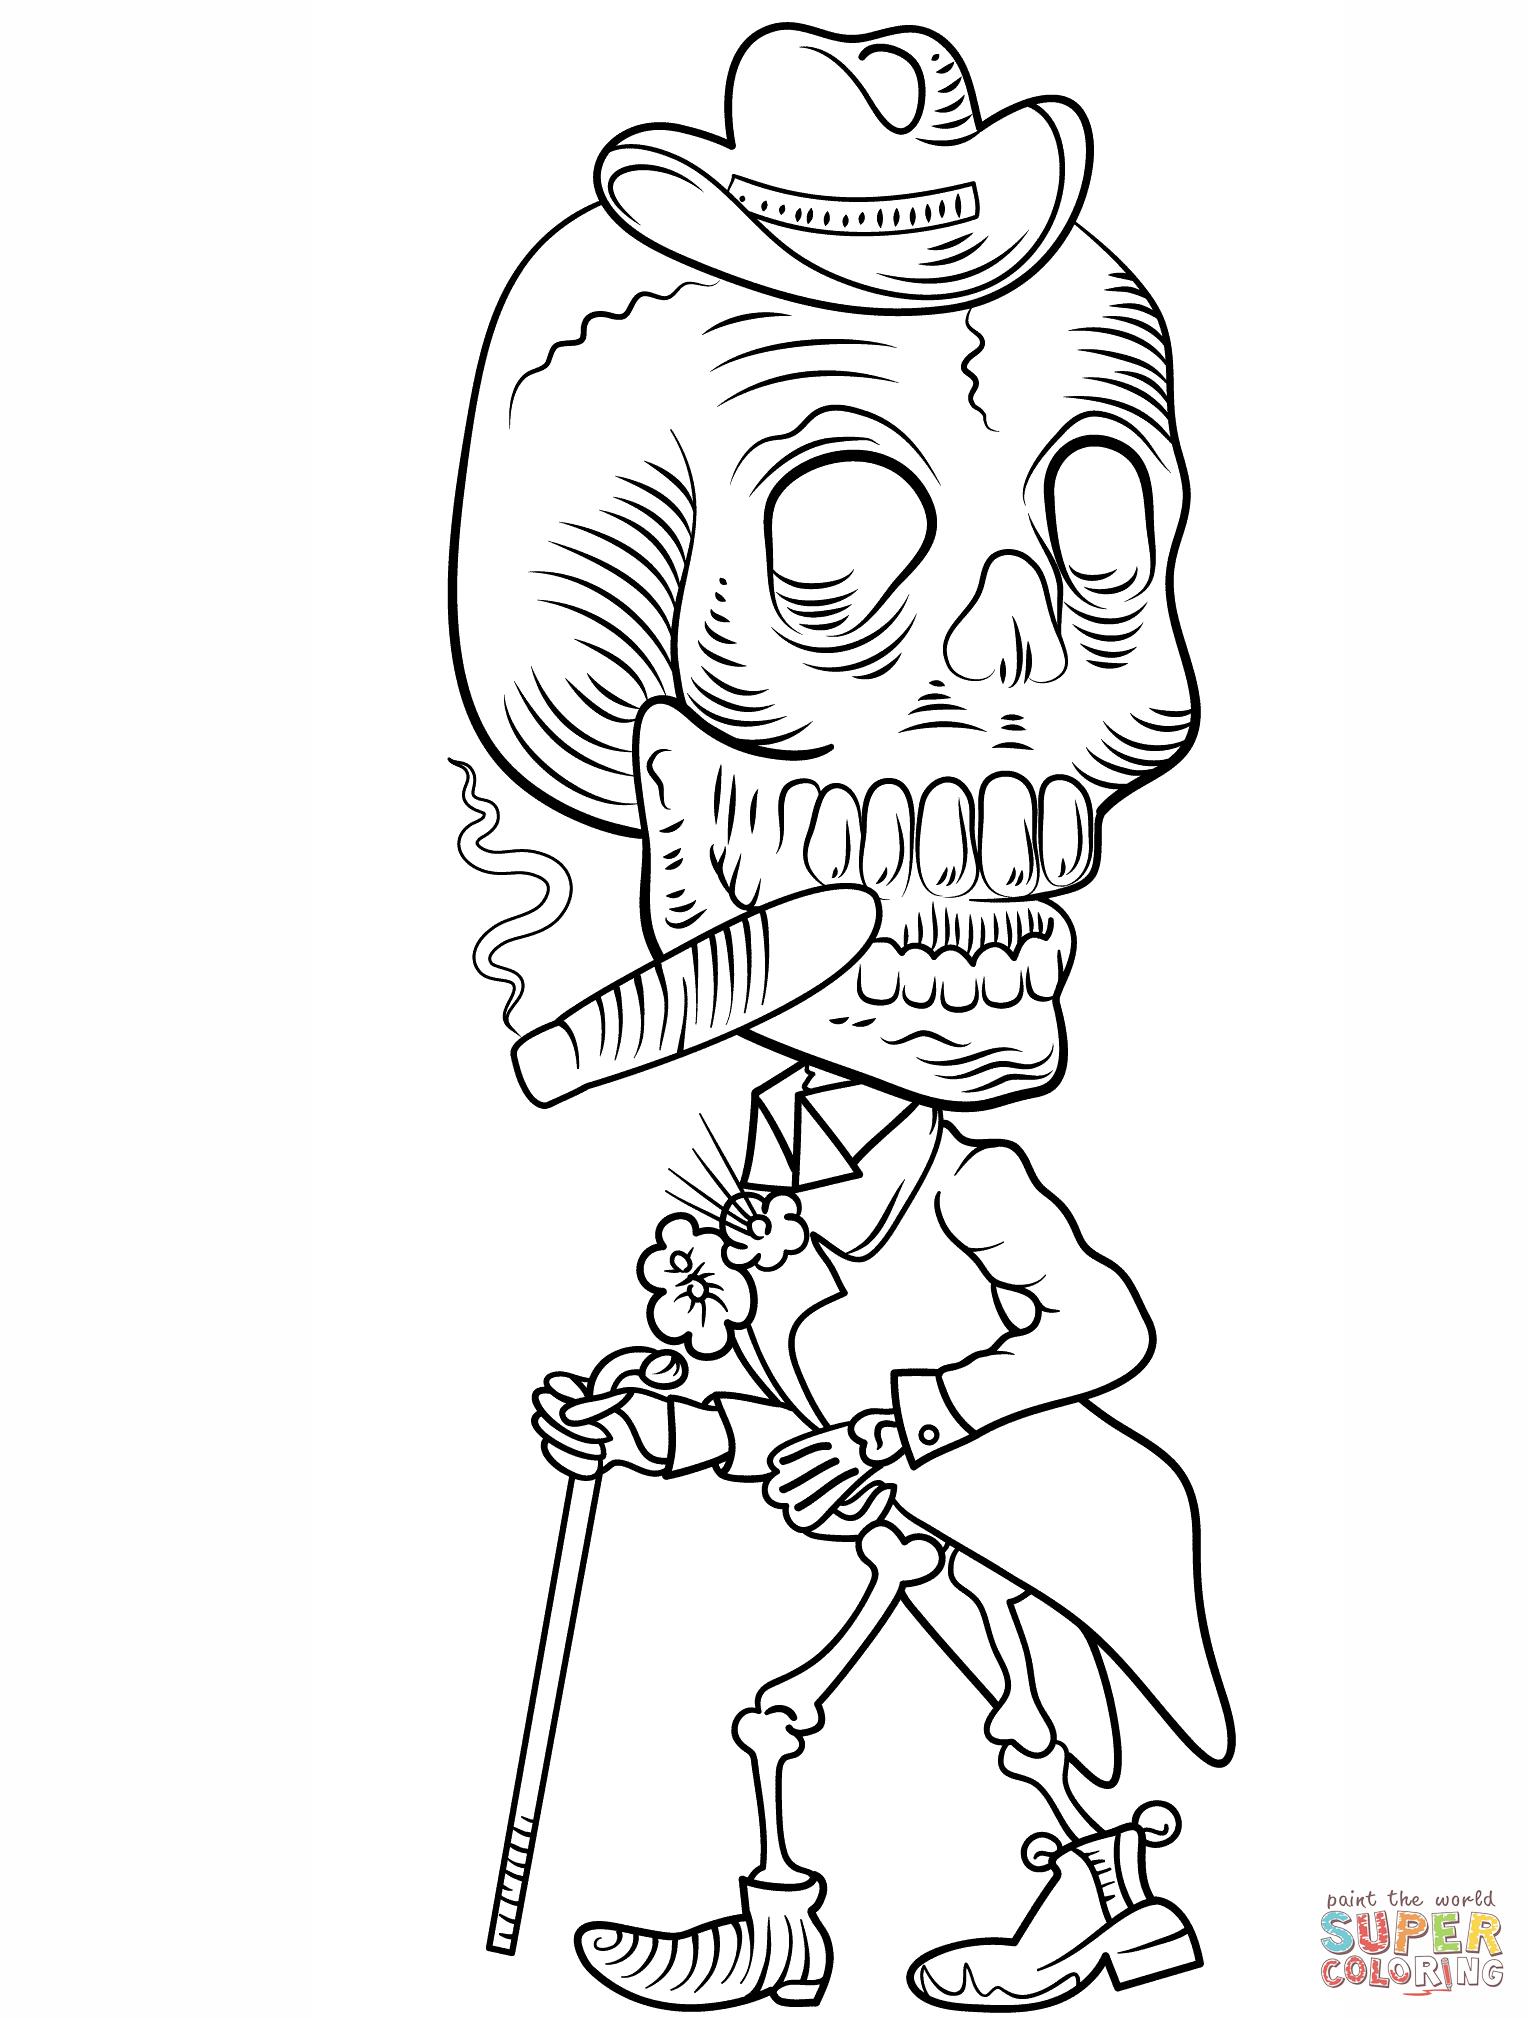 Skeleton Body Drawing At Getdrawings